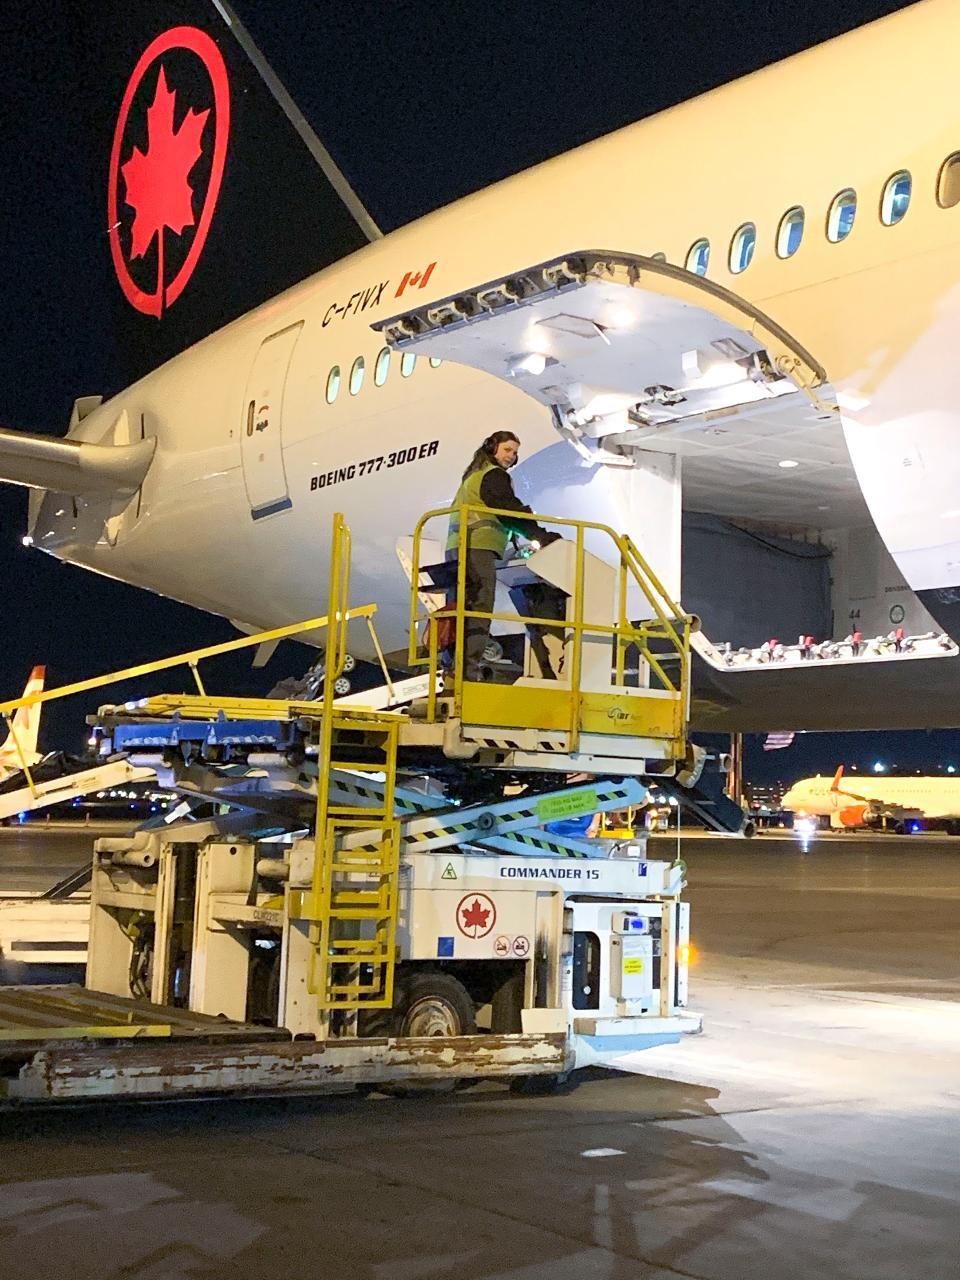 Cargo hatches are wider than passenger door entrances